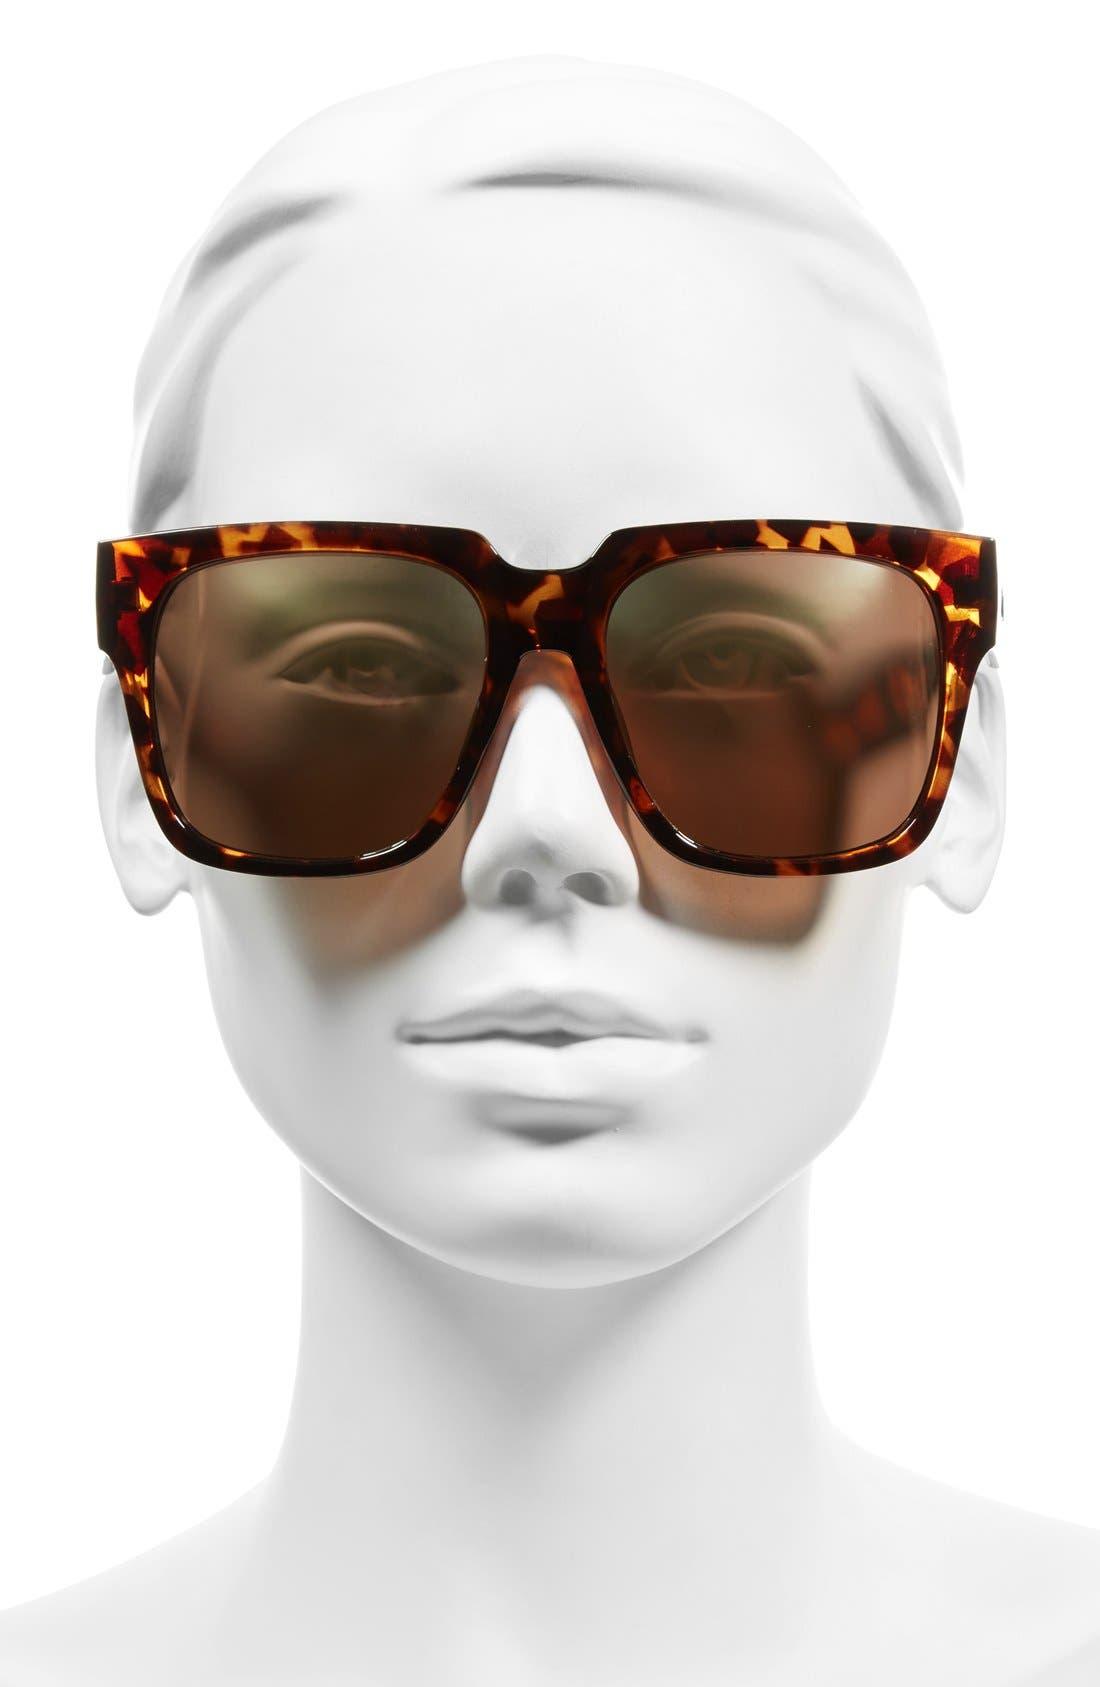 'On the Prowl' 55mm Square Sunglasses,                             Alternate thumbnail 2, color,                             210